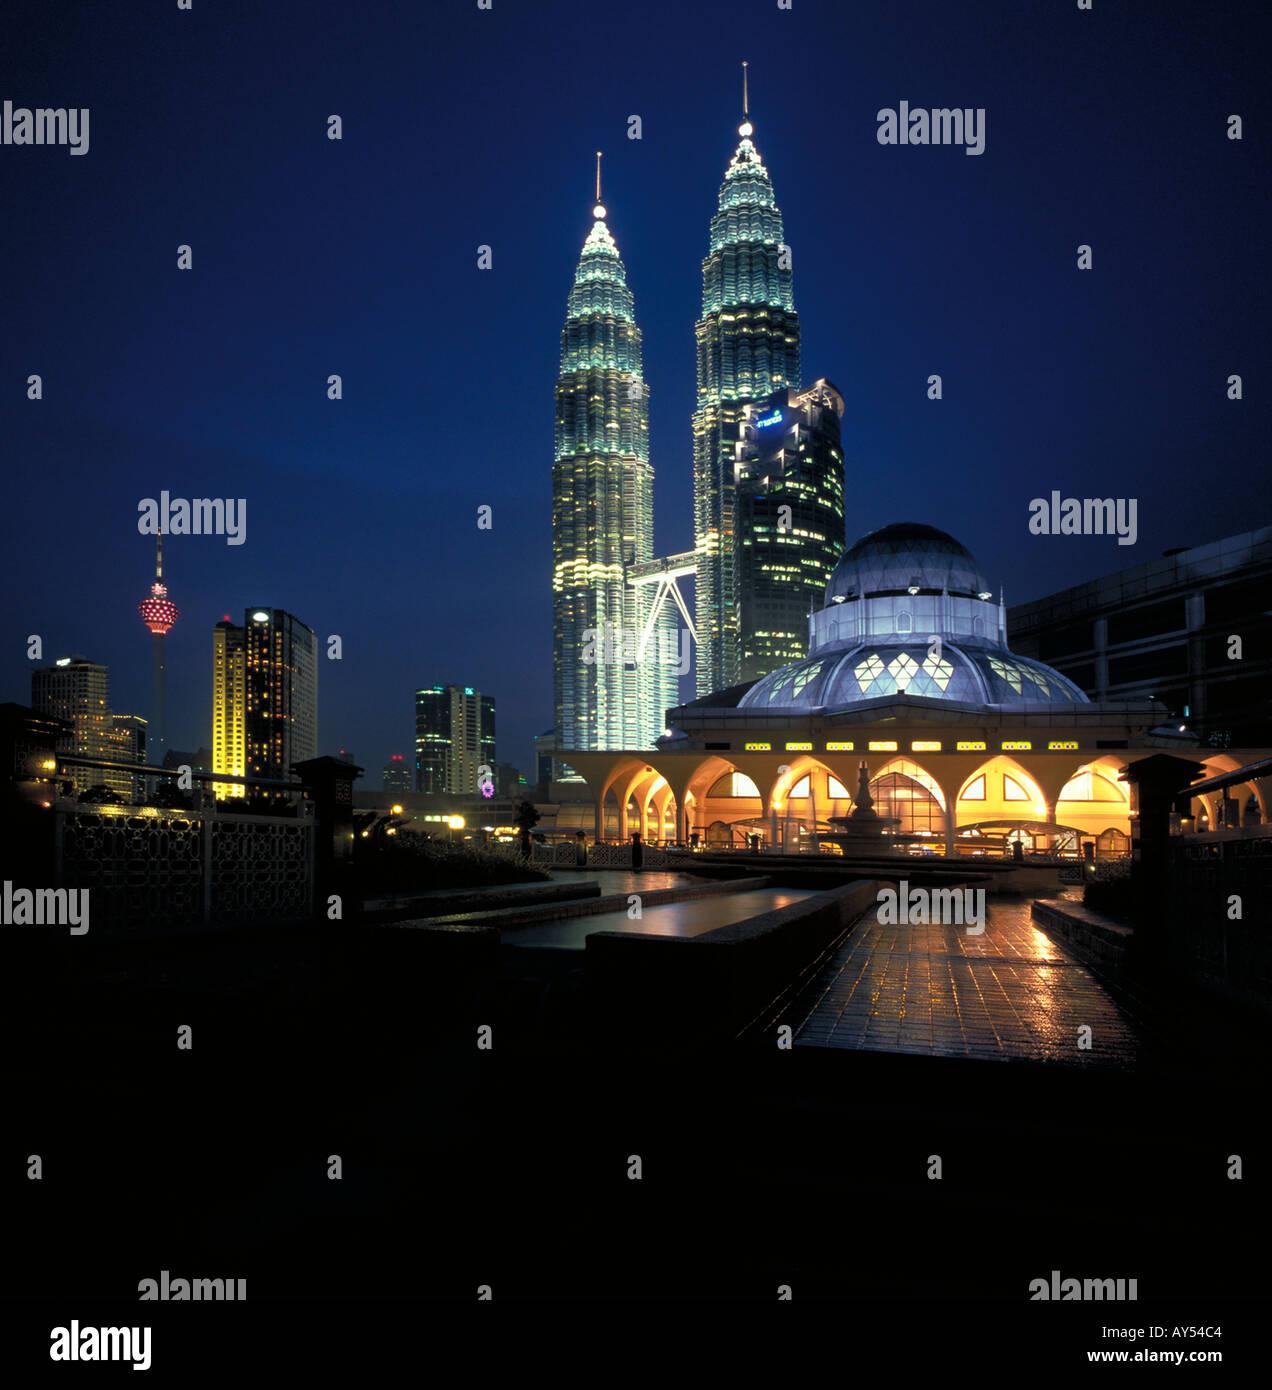 Petronas twin towers and mosque at night kuala lumpur malaysia petronas twin towers and mosque at night kuala lumpur malaysia south east asia at night buycottarizona Gallery